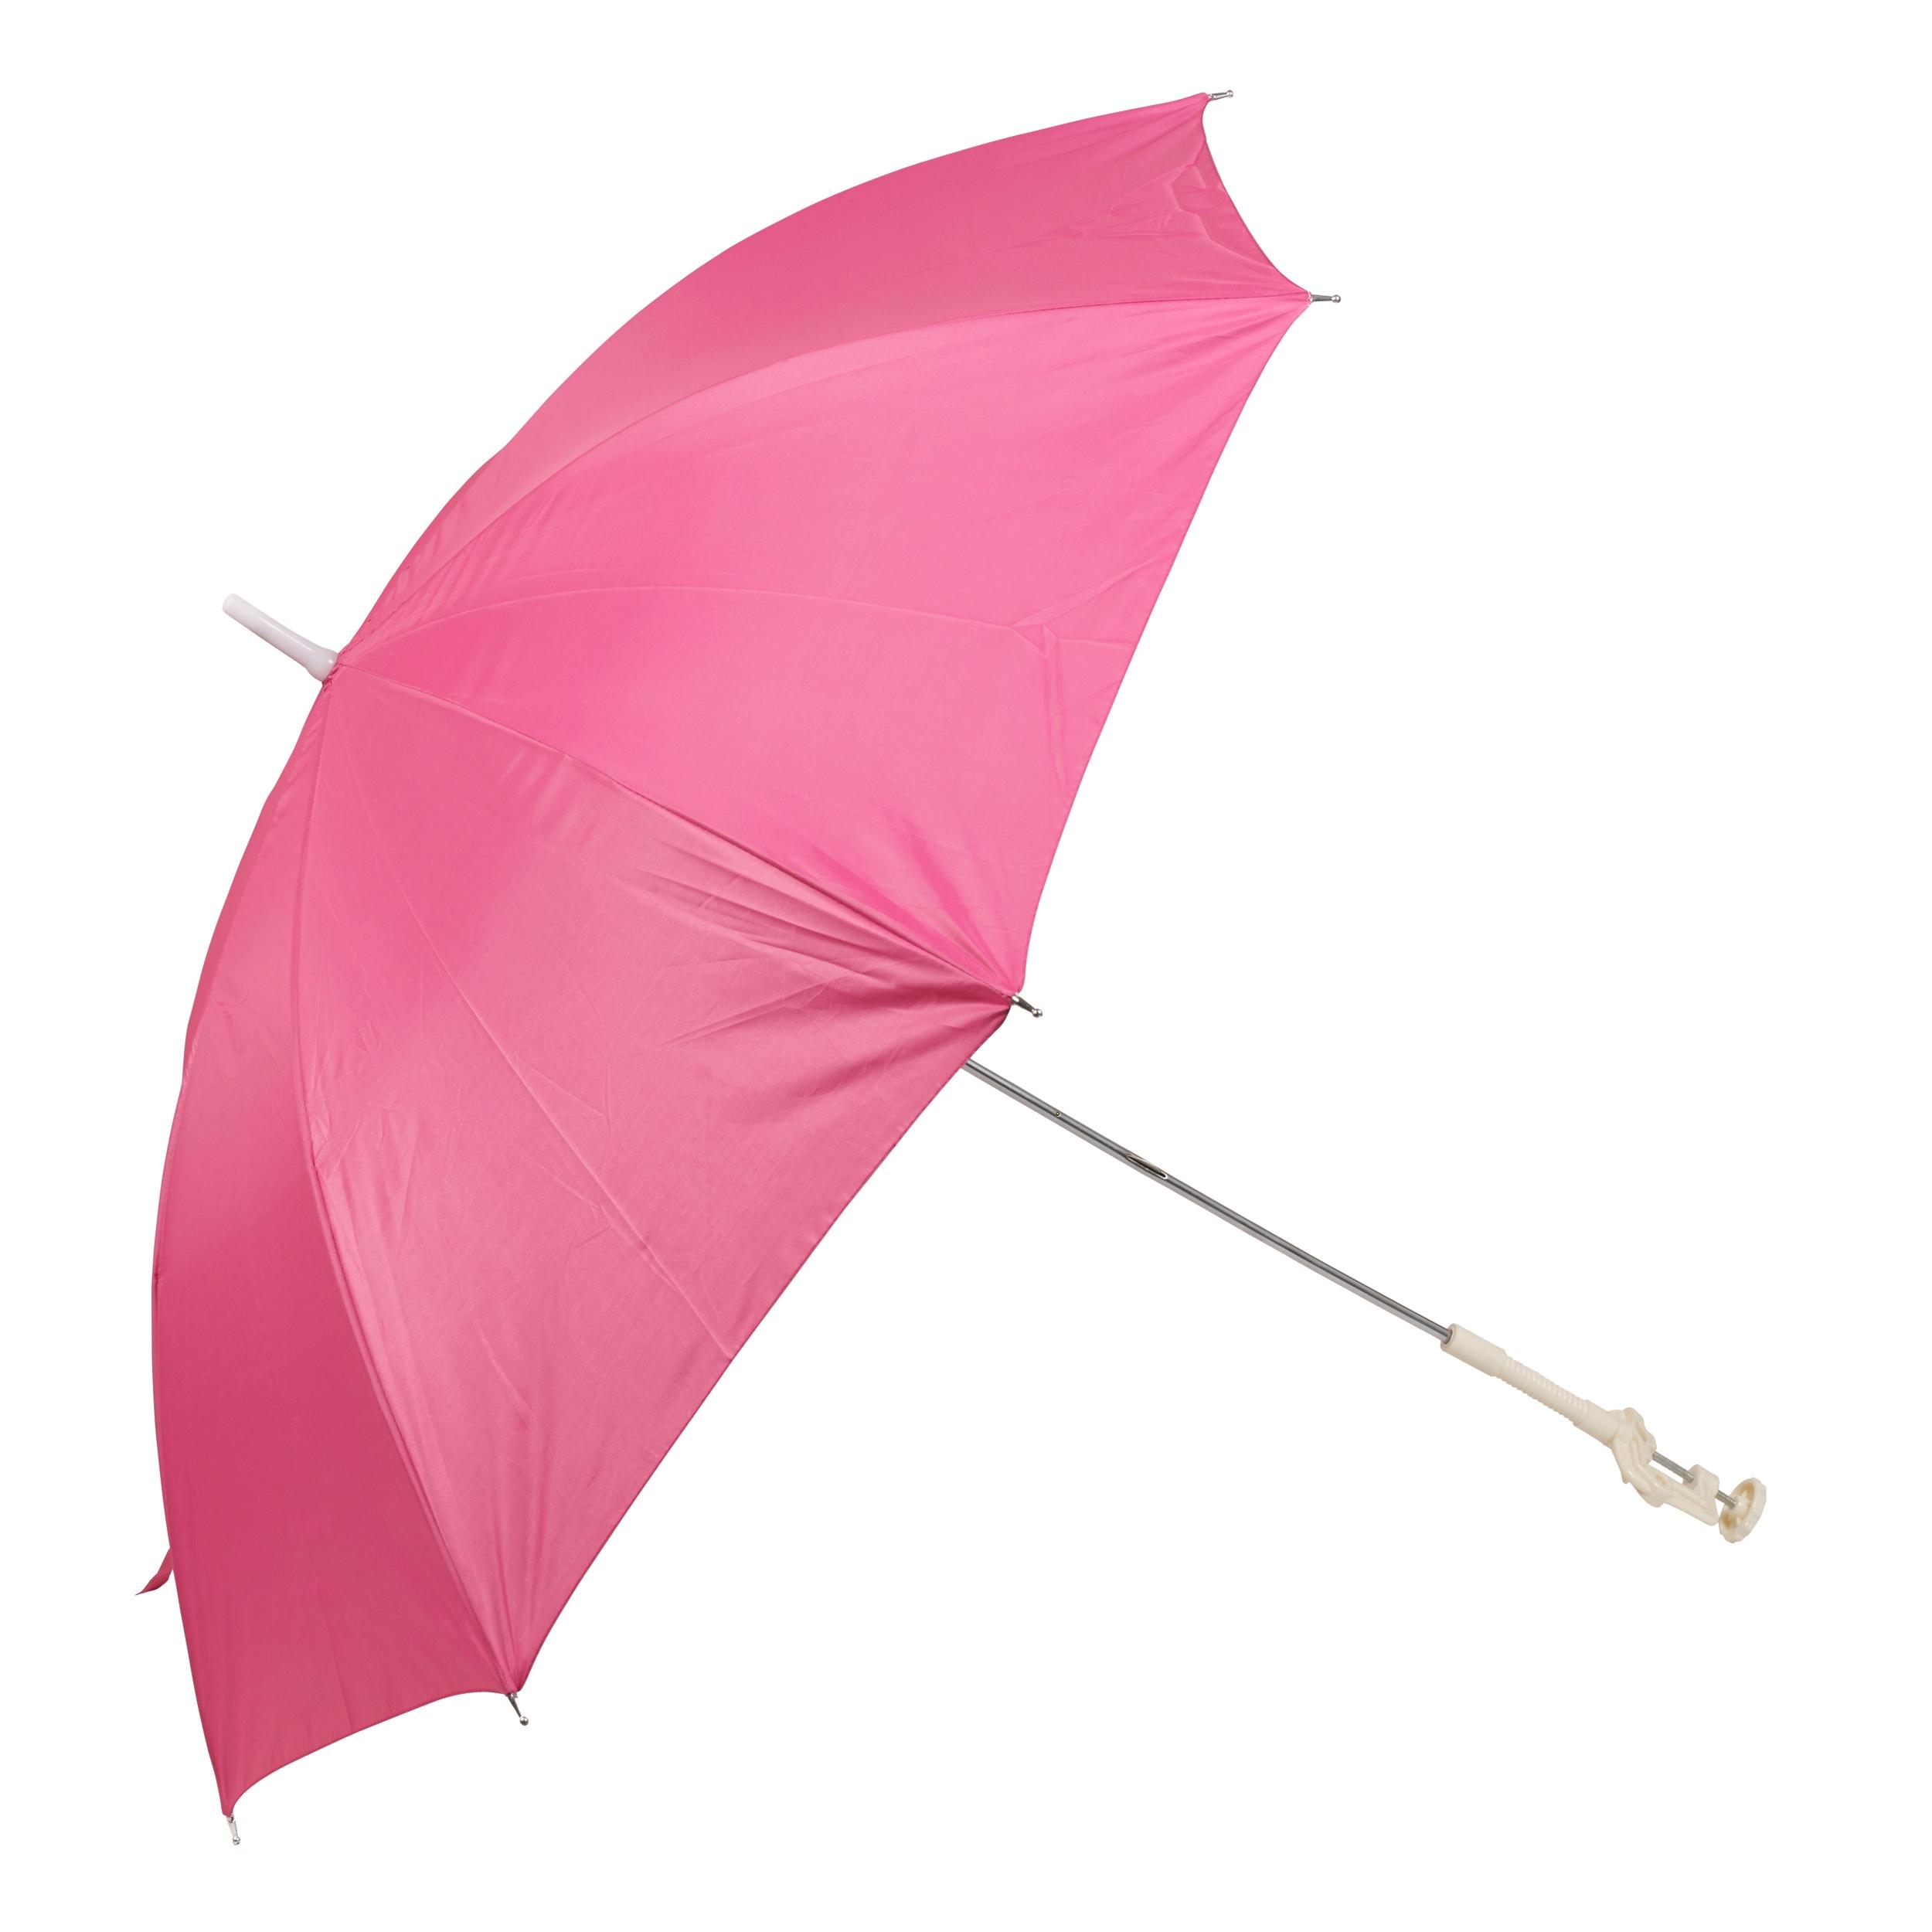 screw clamp garden beach deck chair parasol sunshade sun. Black Bedroom Furniture Sets. Home Design Ideas